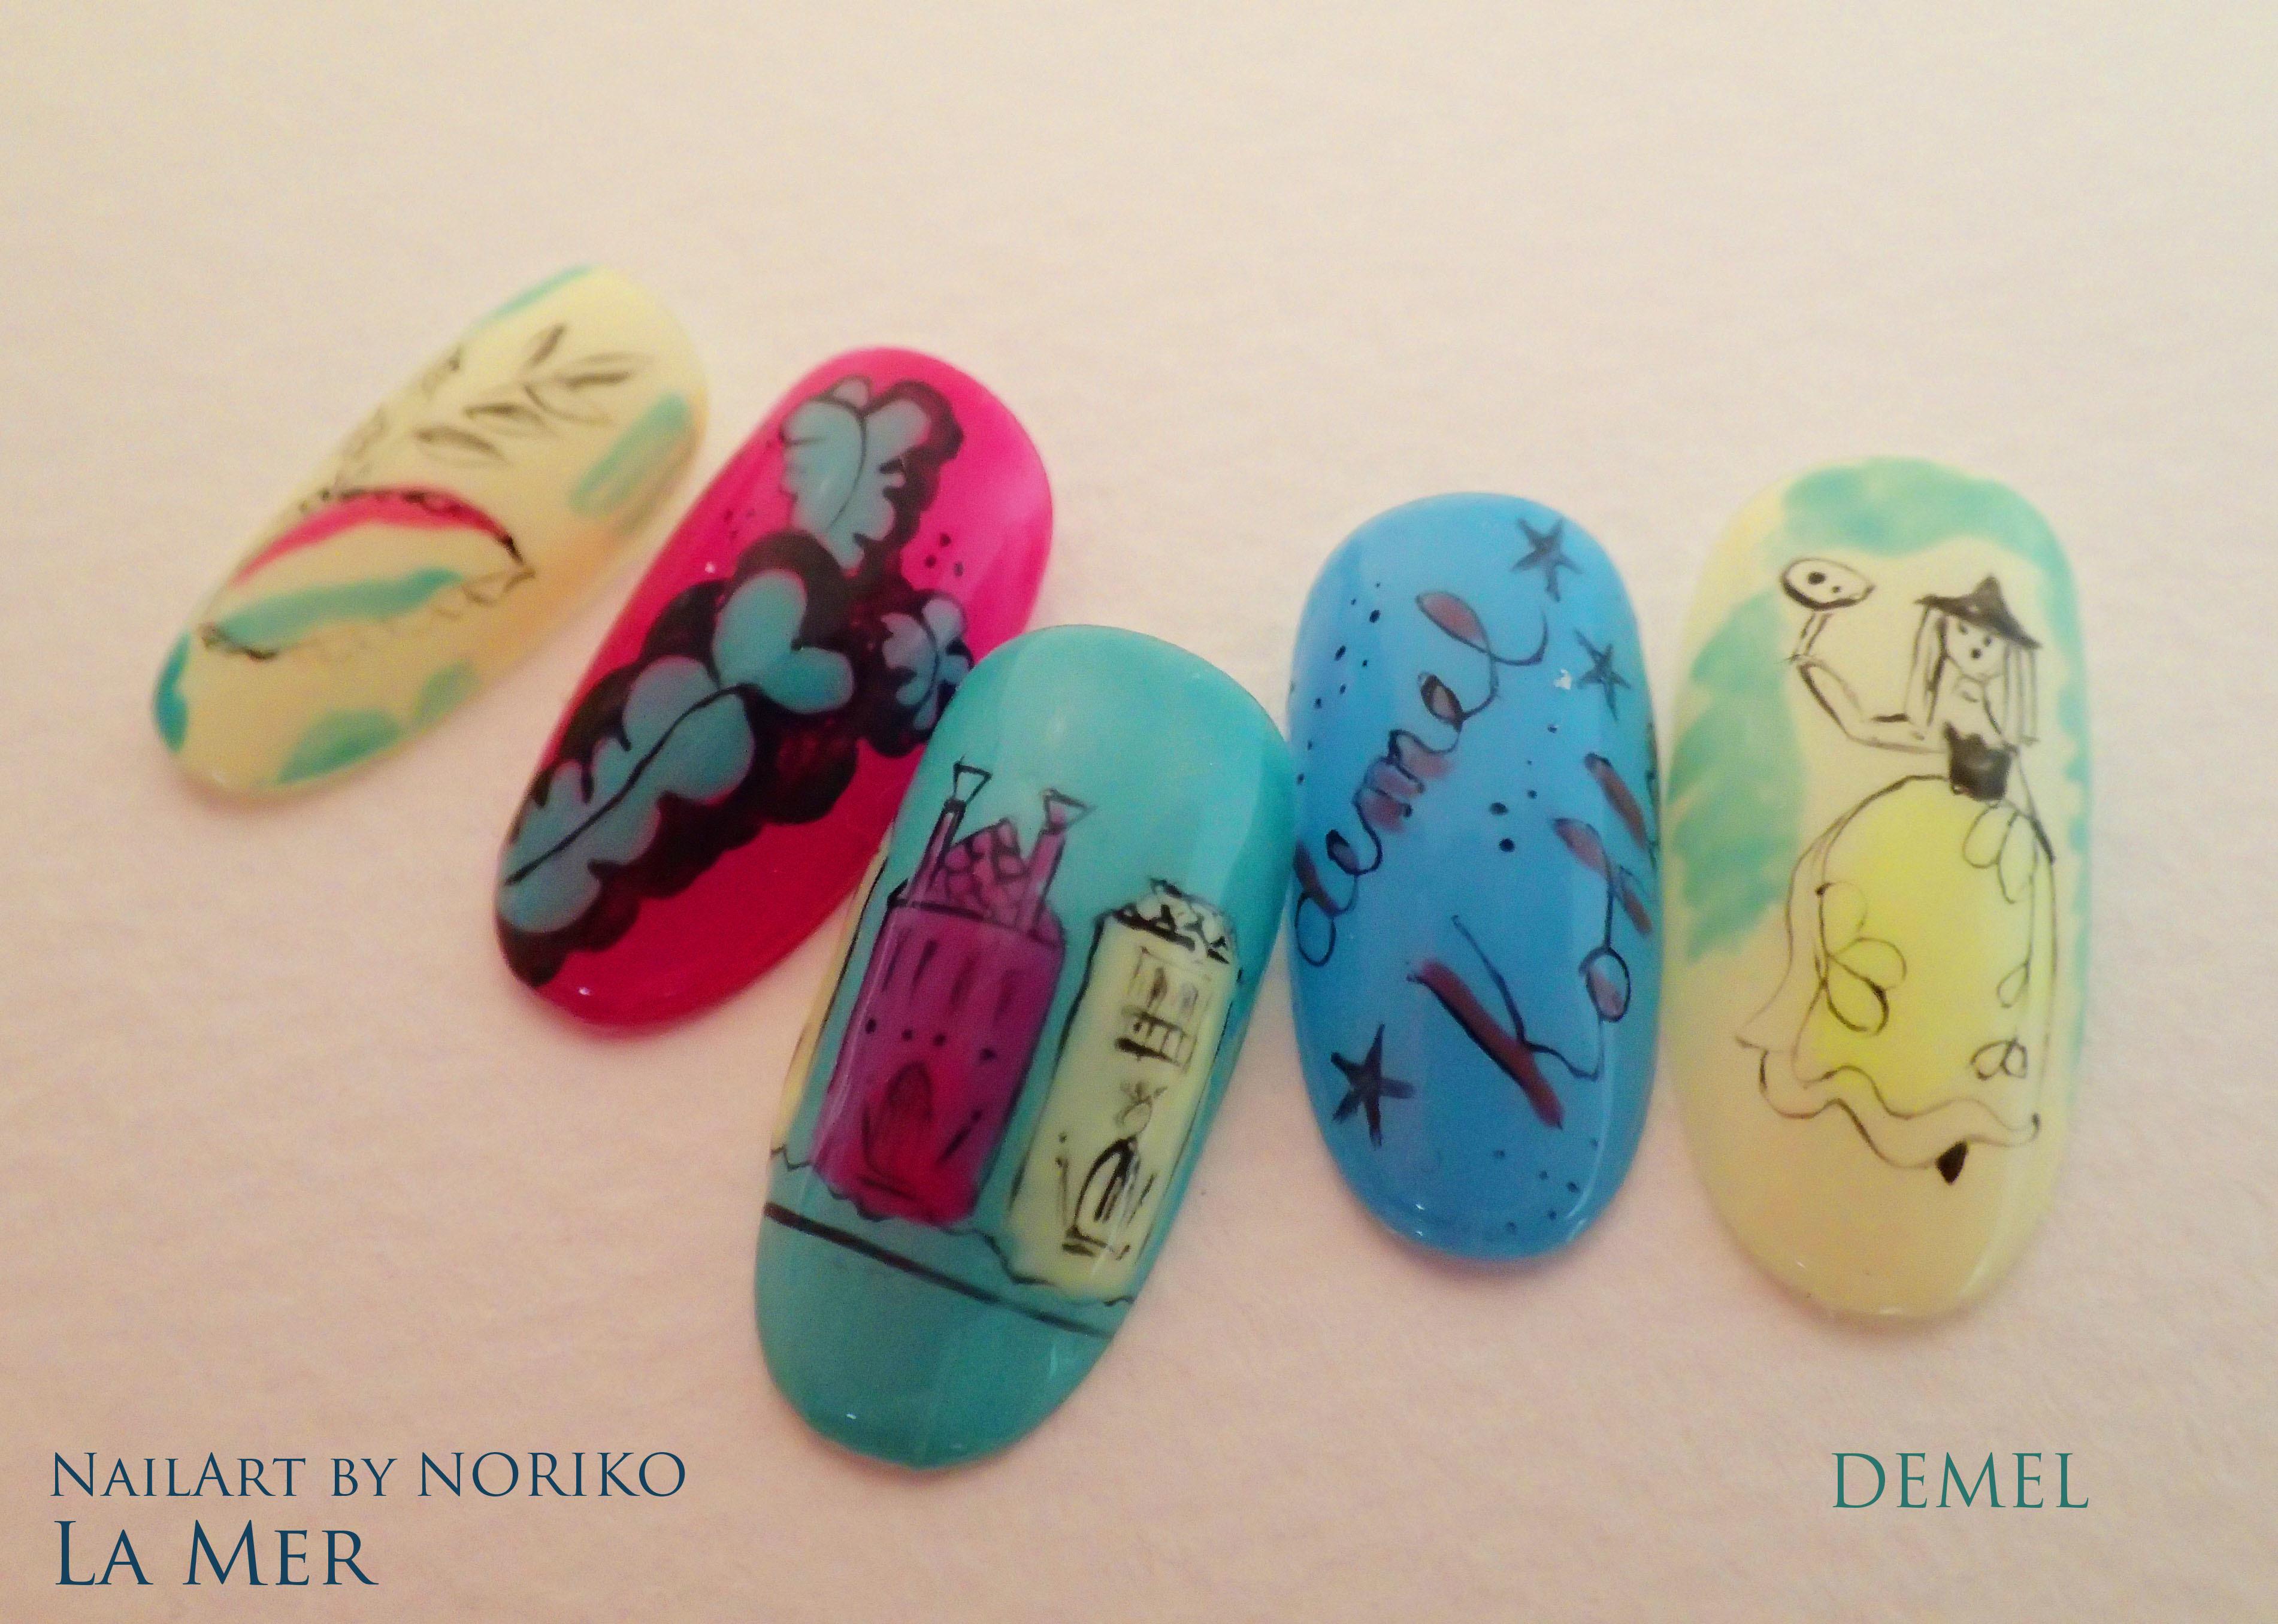 Nail Artist NORIKO demel 9